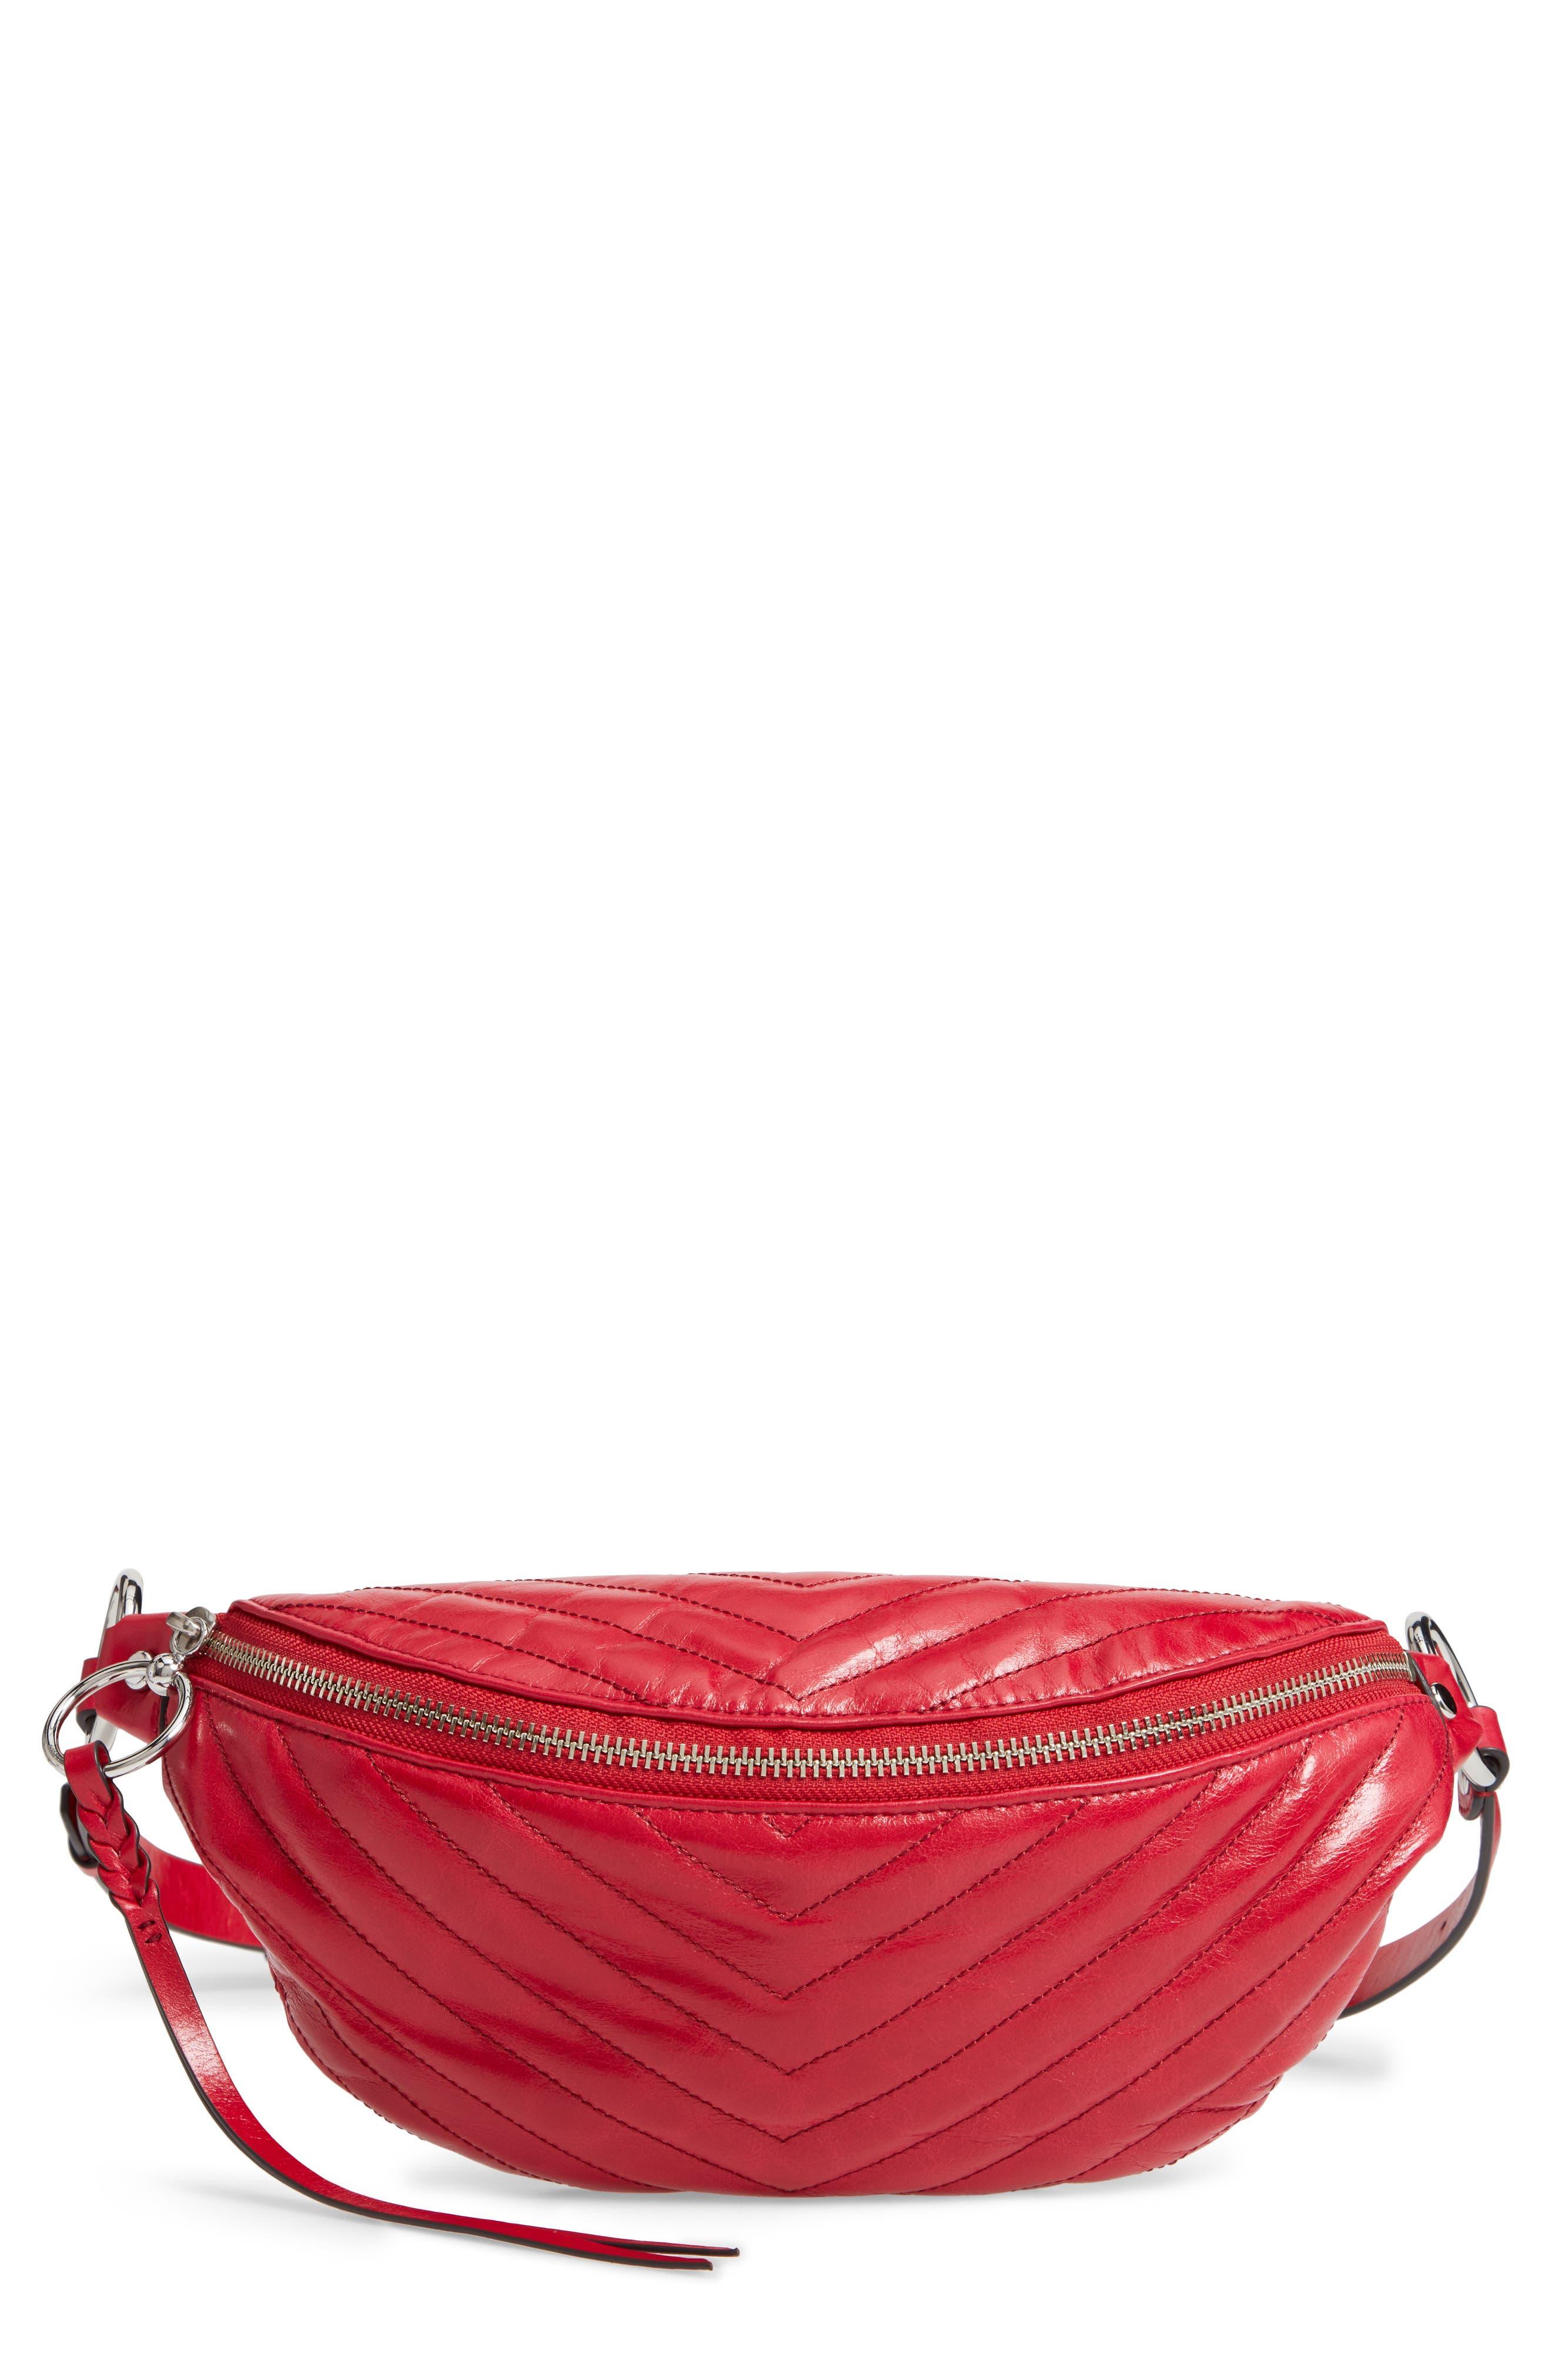 REBECCA MINKOFF, Edie Leather Belt Bag, Main thumbnail 1, color, 600